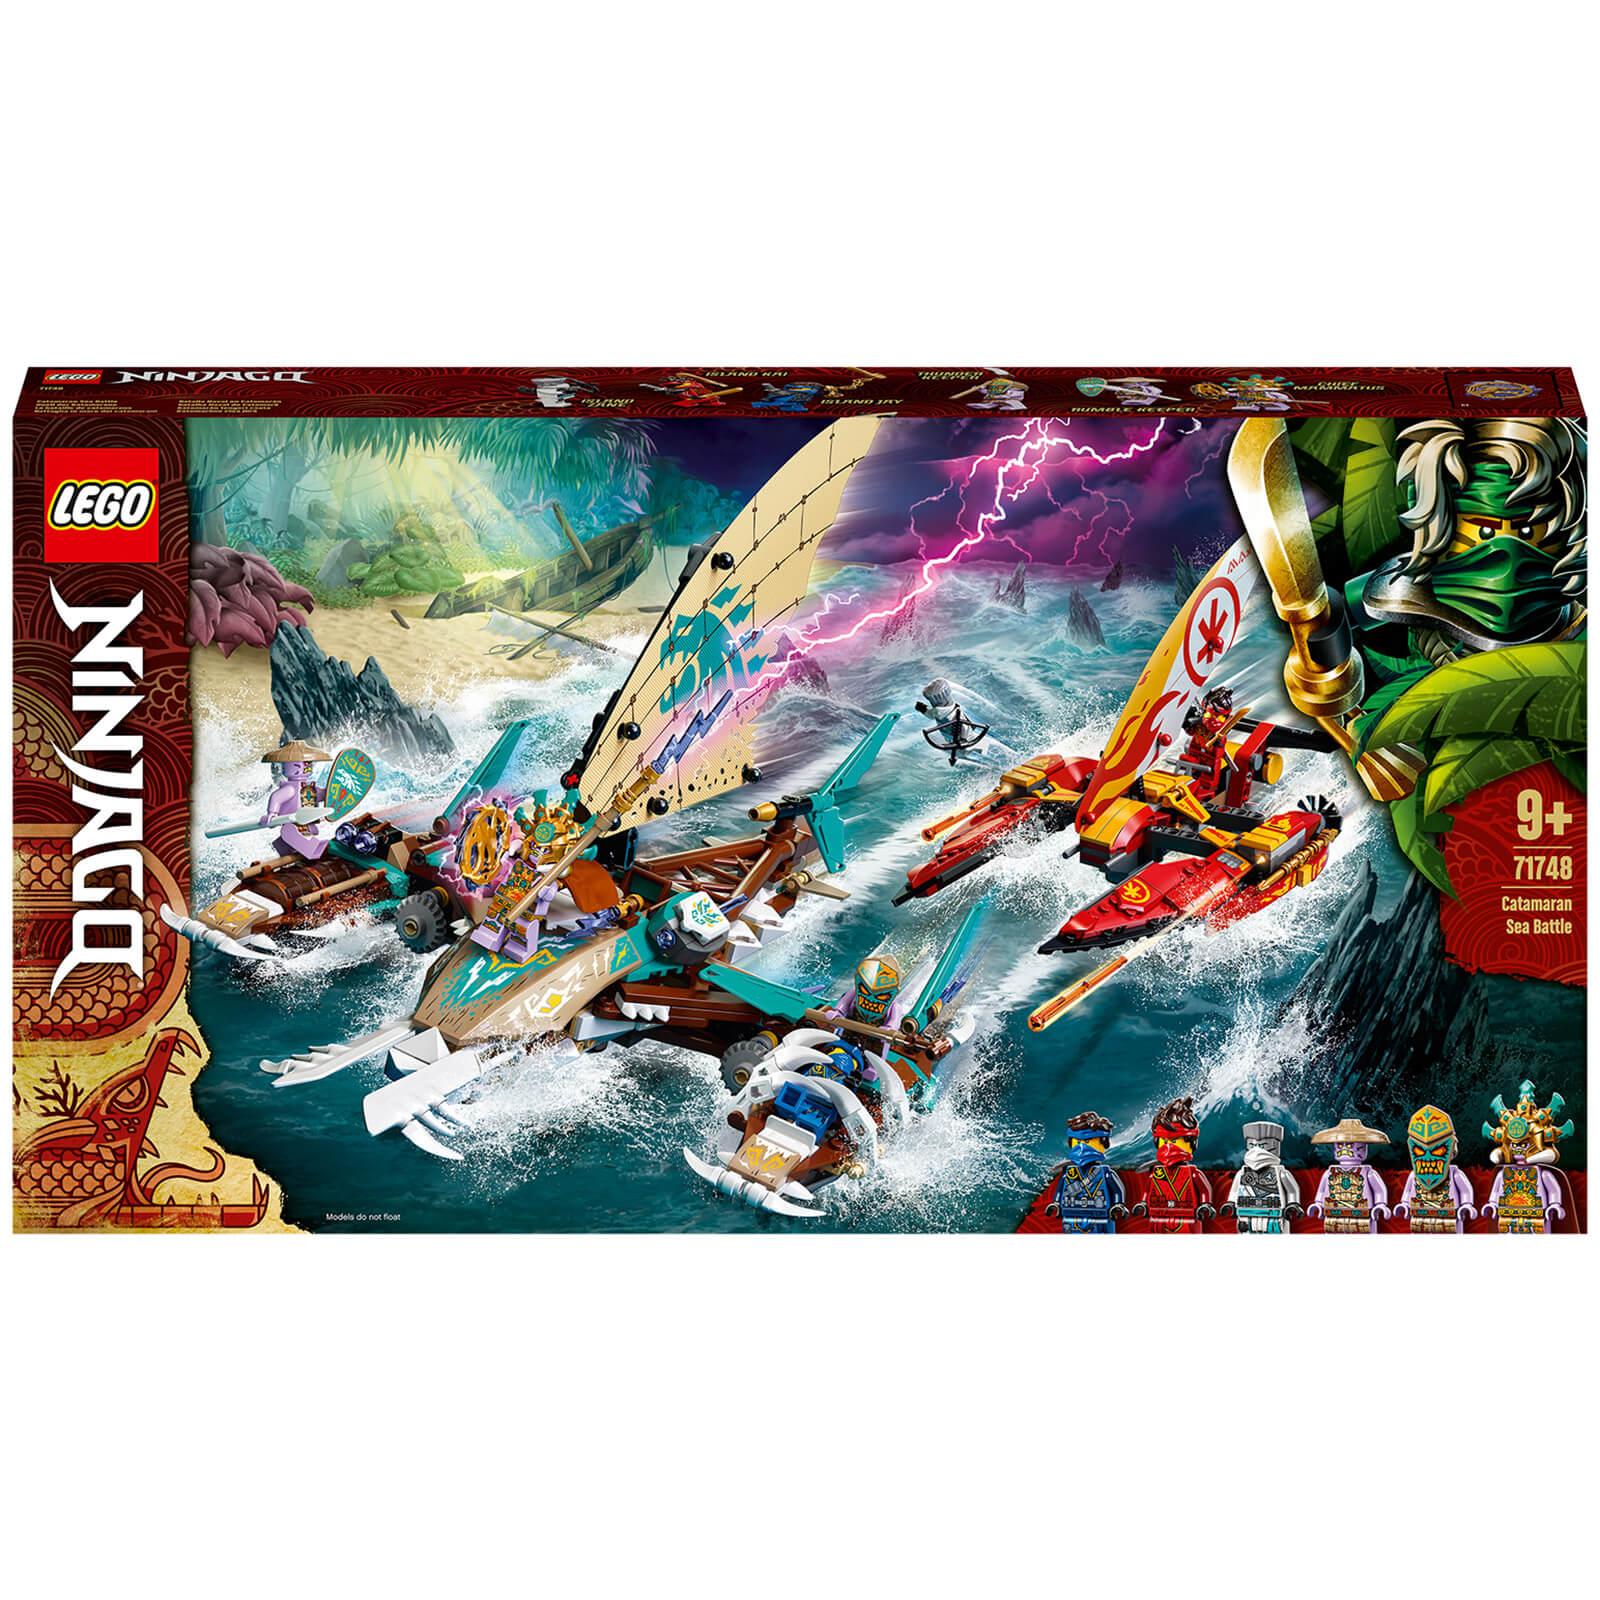 Image of LEGO NINJAGO: Catamaran Sea Battle Building Set (71748)